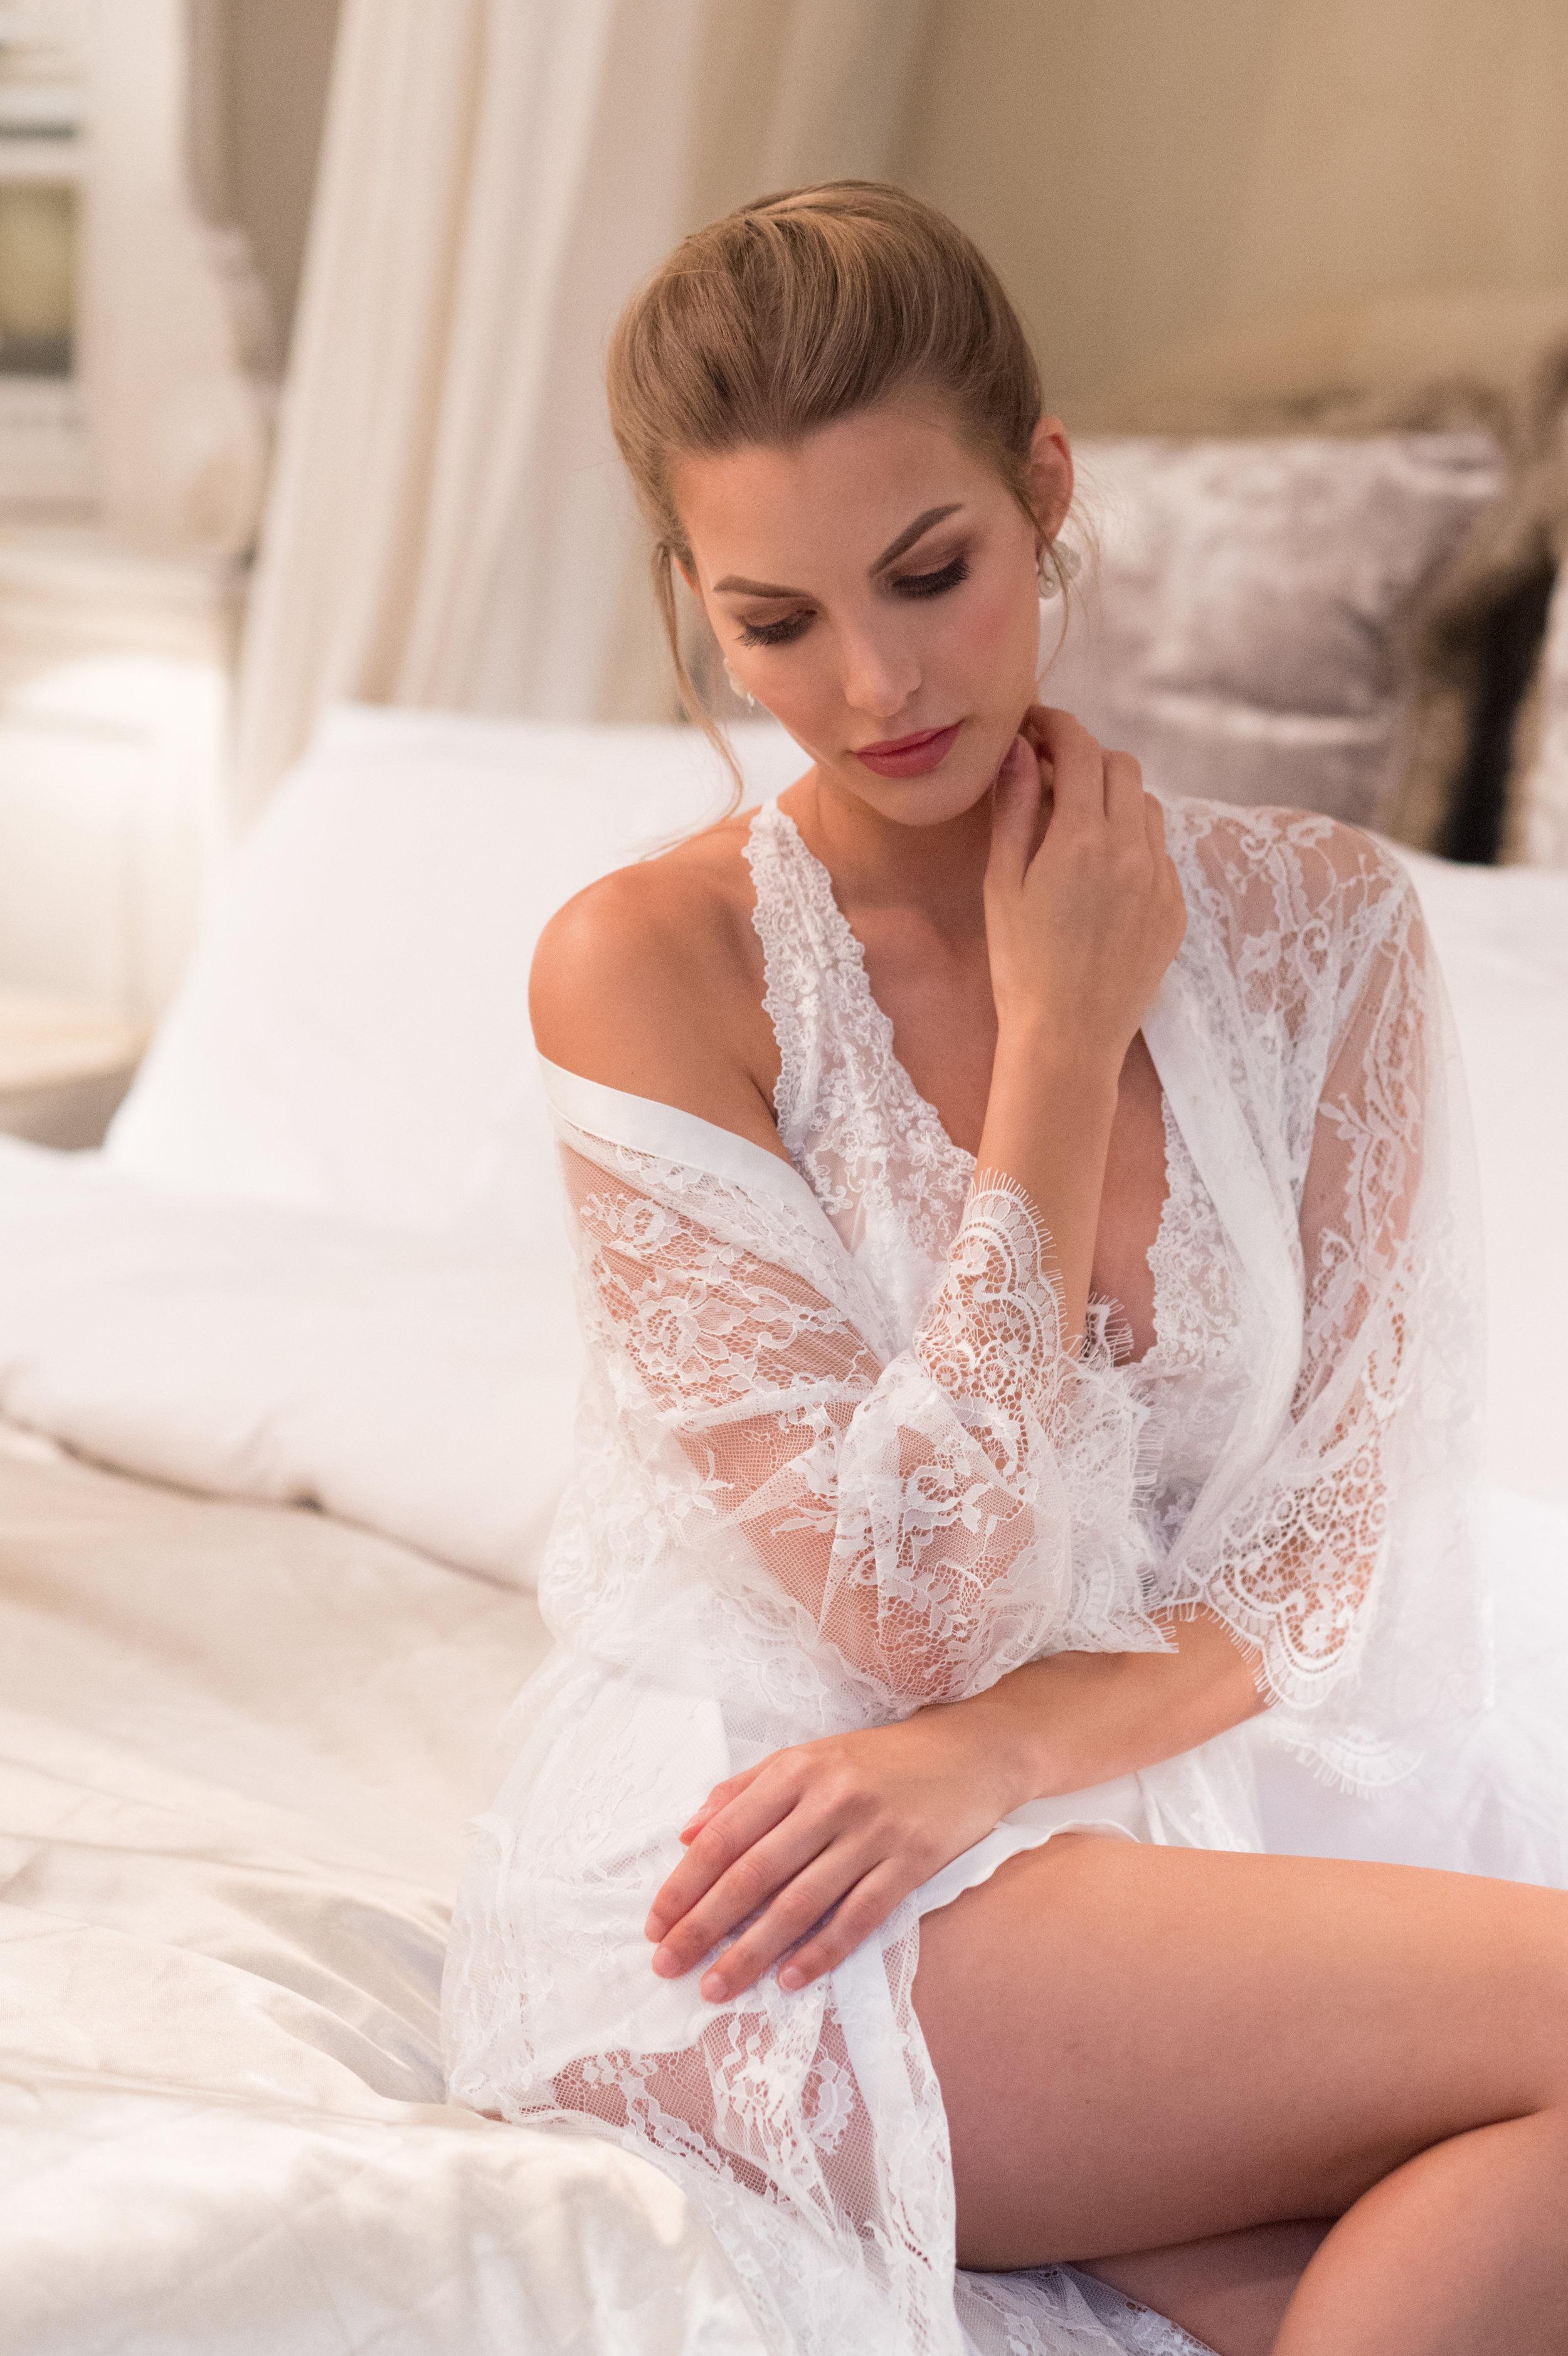 Elegant Bridal Boudoirshoot a009b.jpg